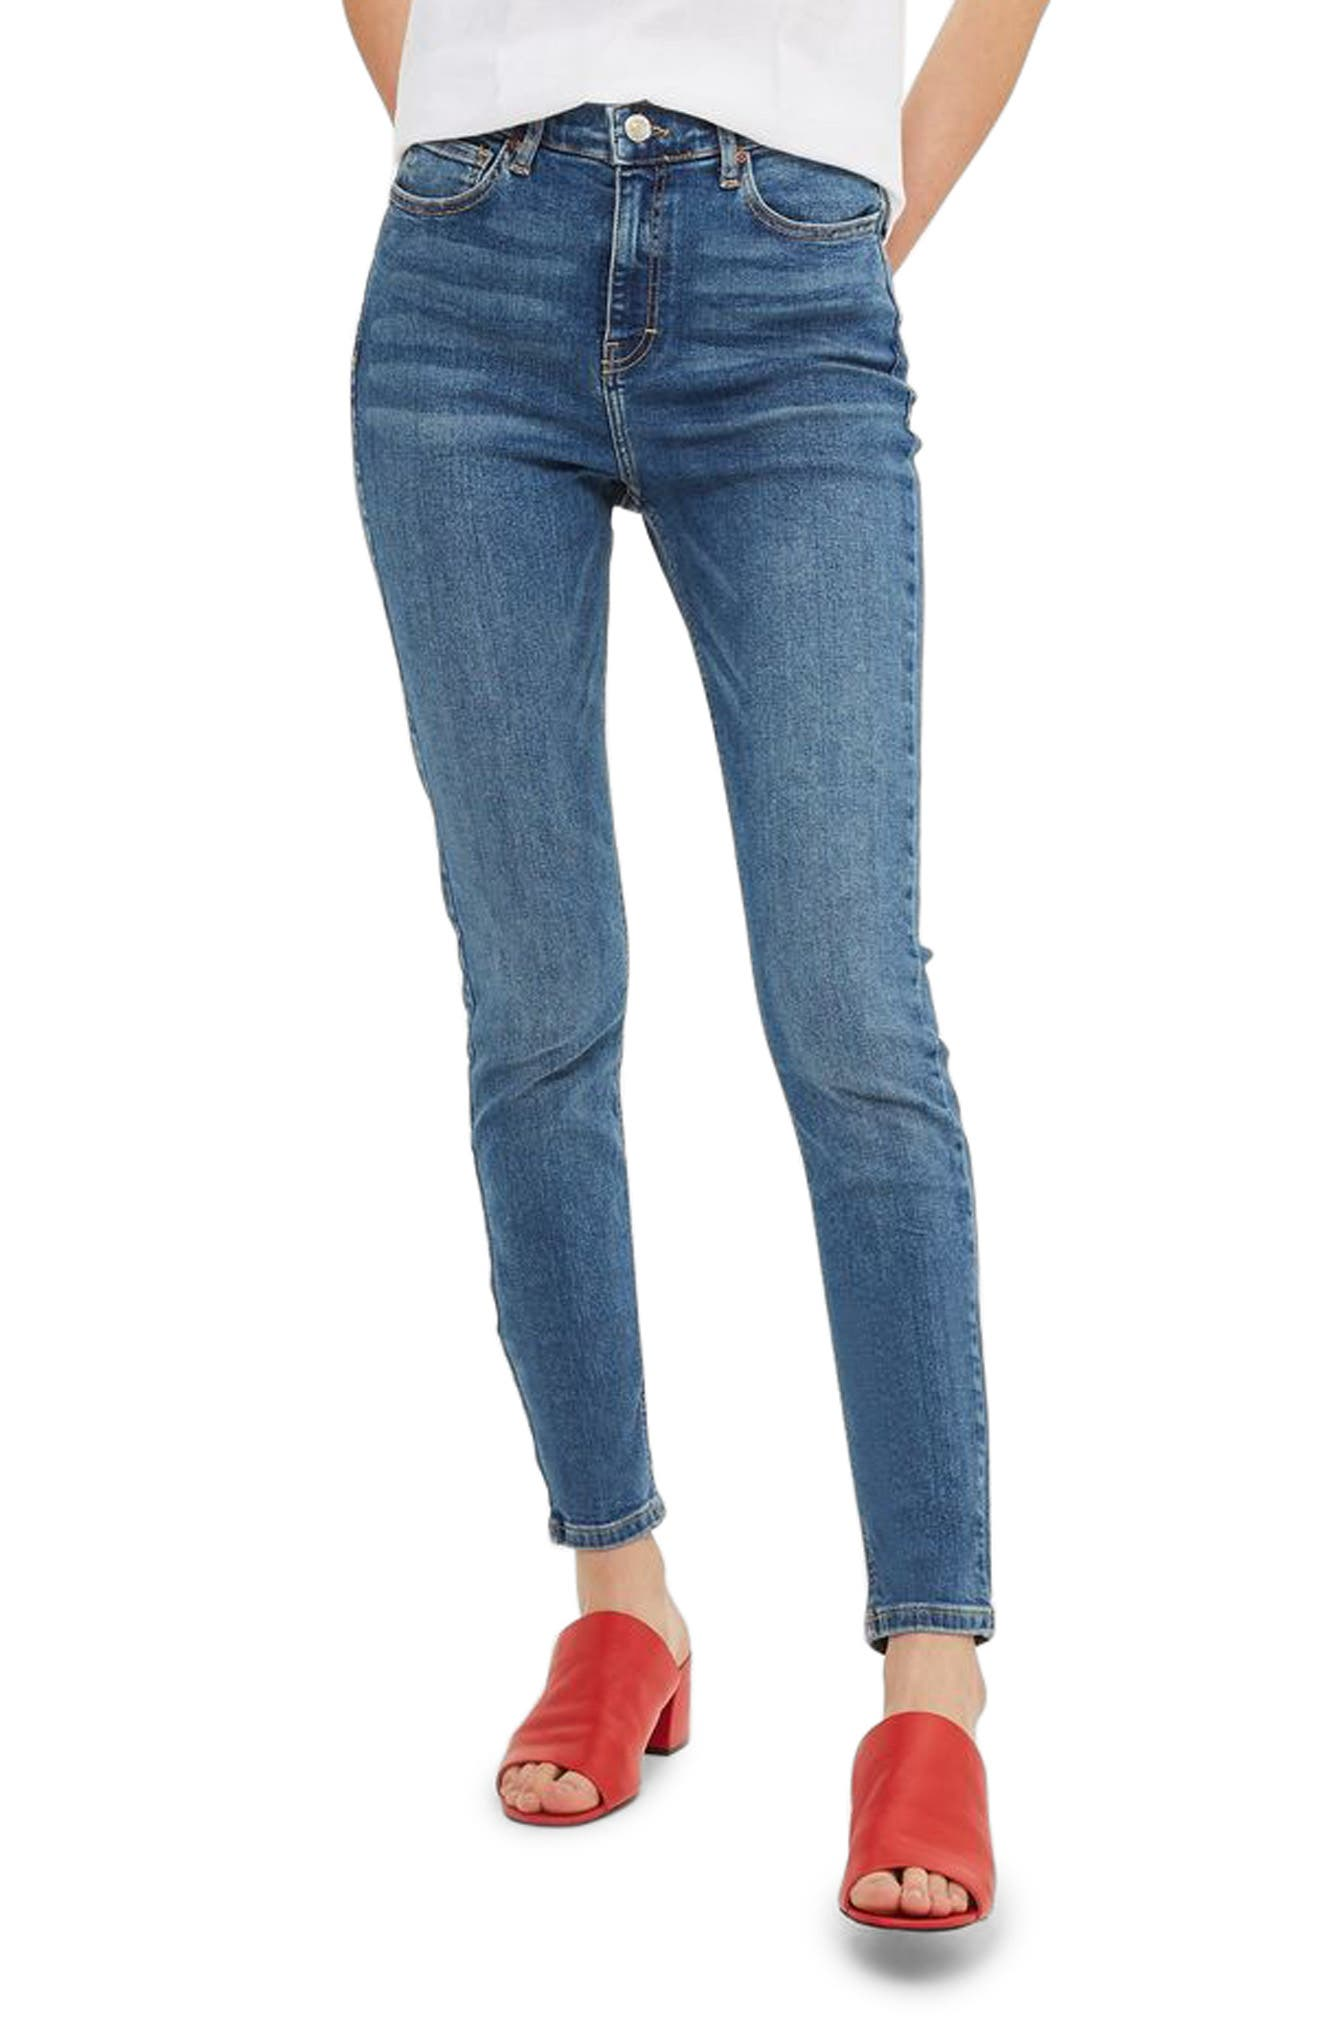 Main Image - Topshop Jamie High Waist Ankle Skinny Jeans (Tall)